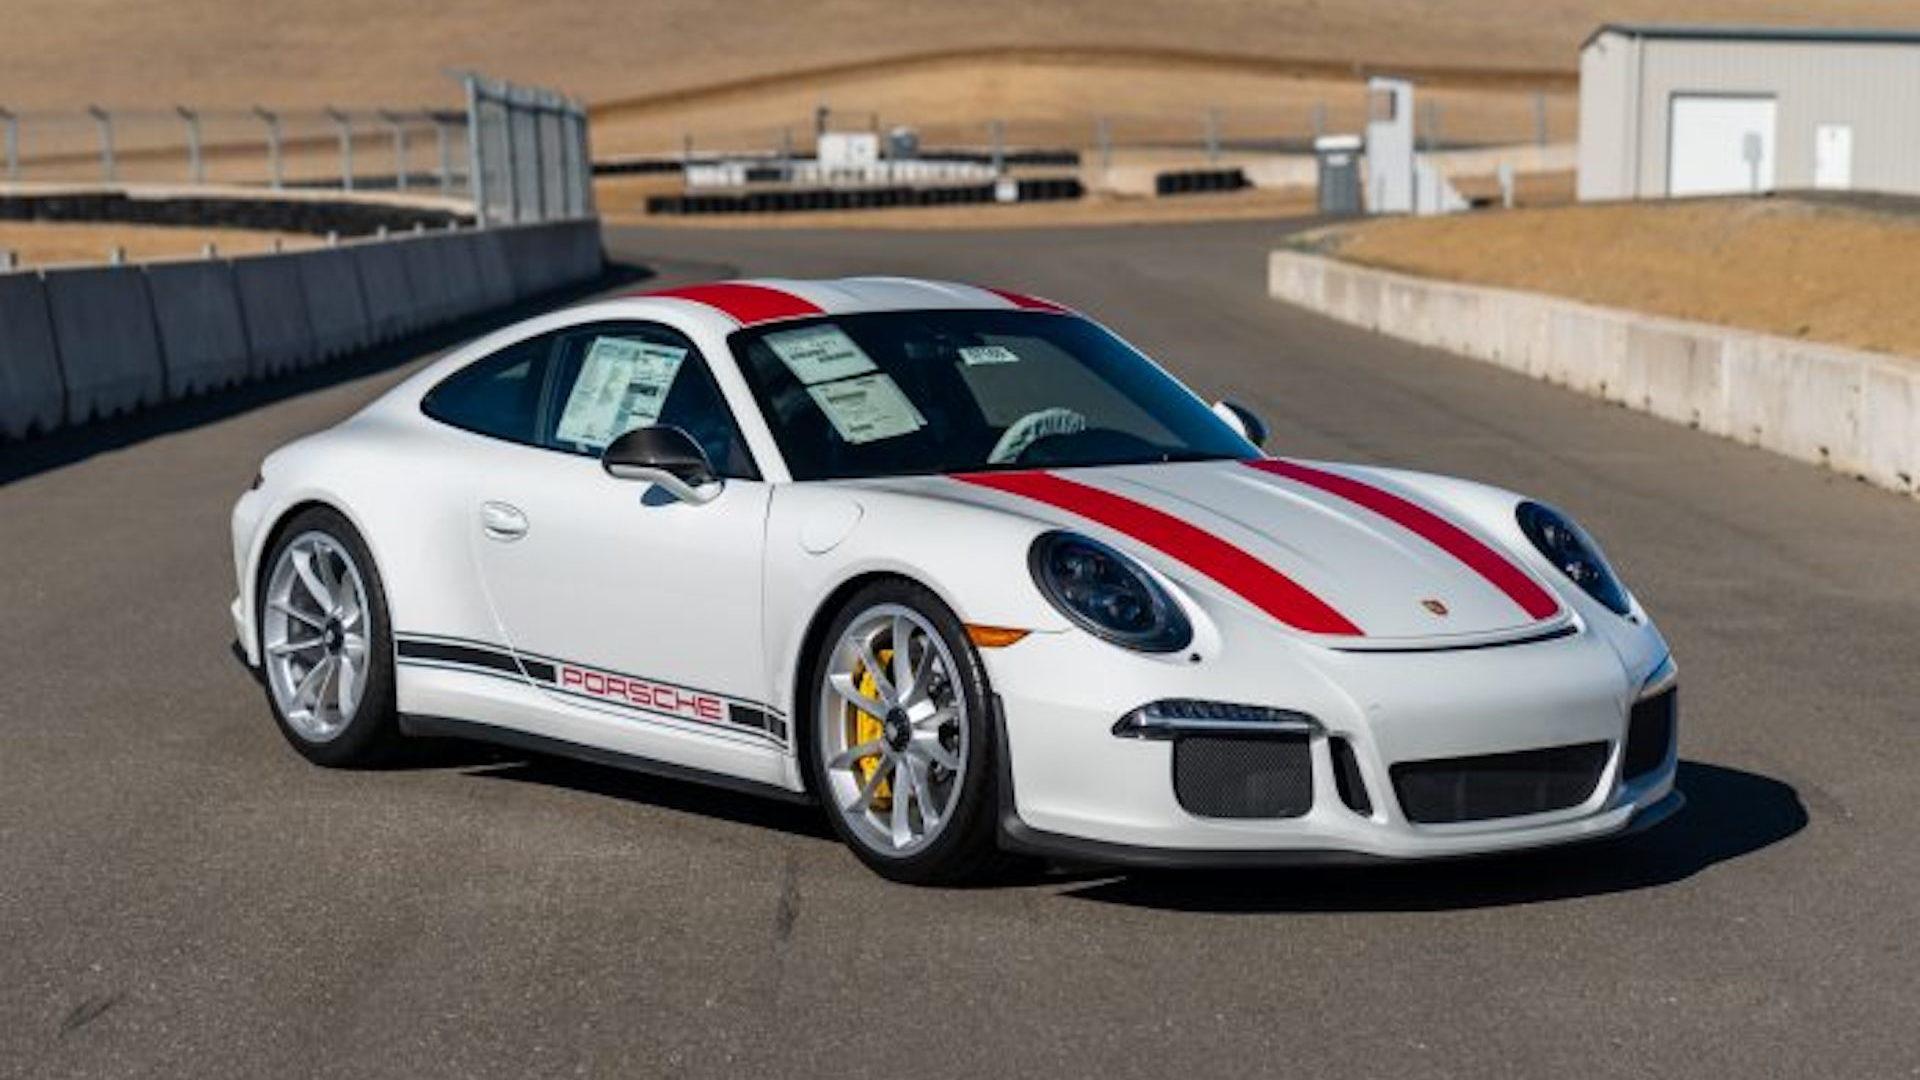 2016 Porsche 911 R, via Gooding & Company